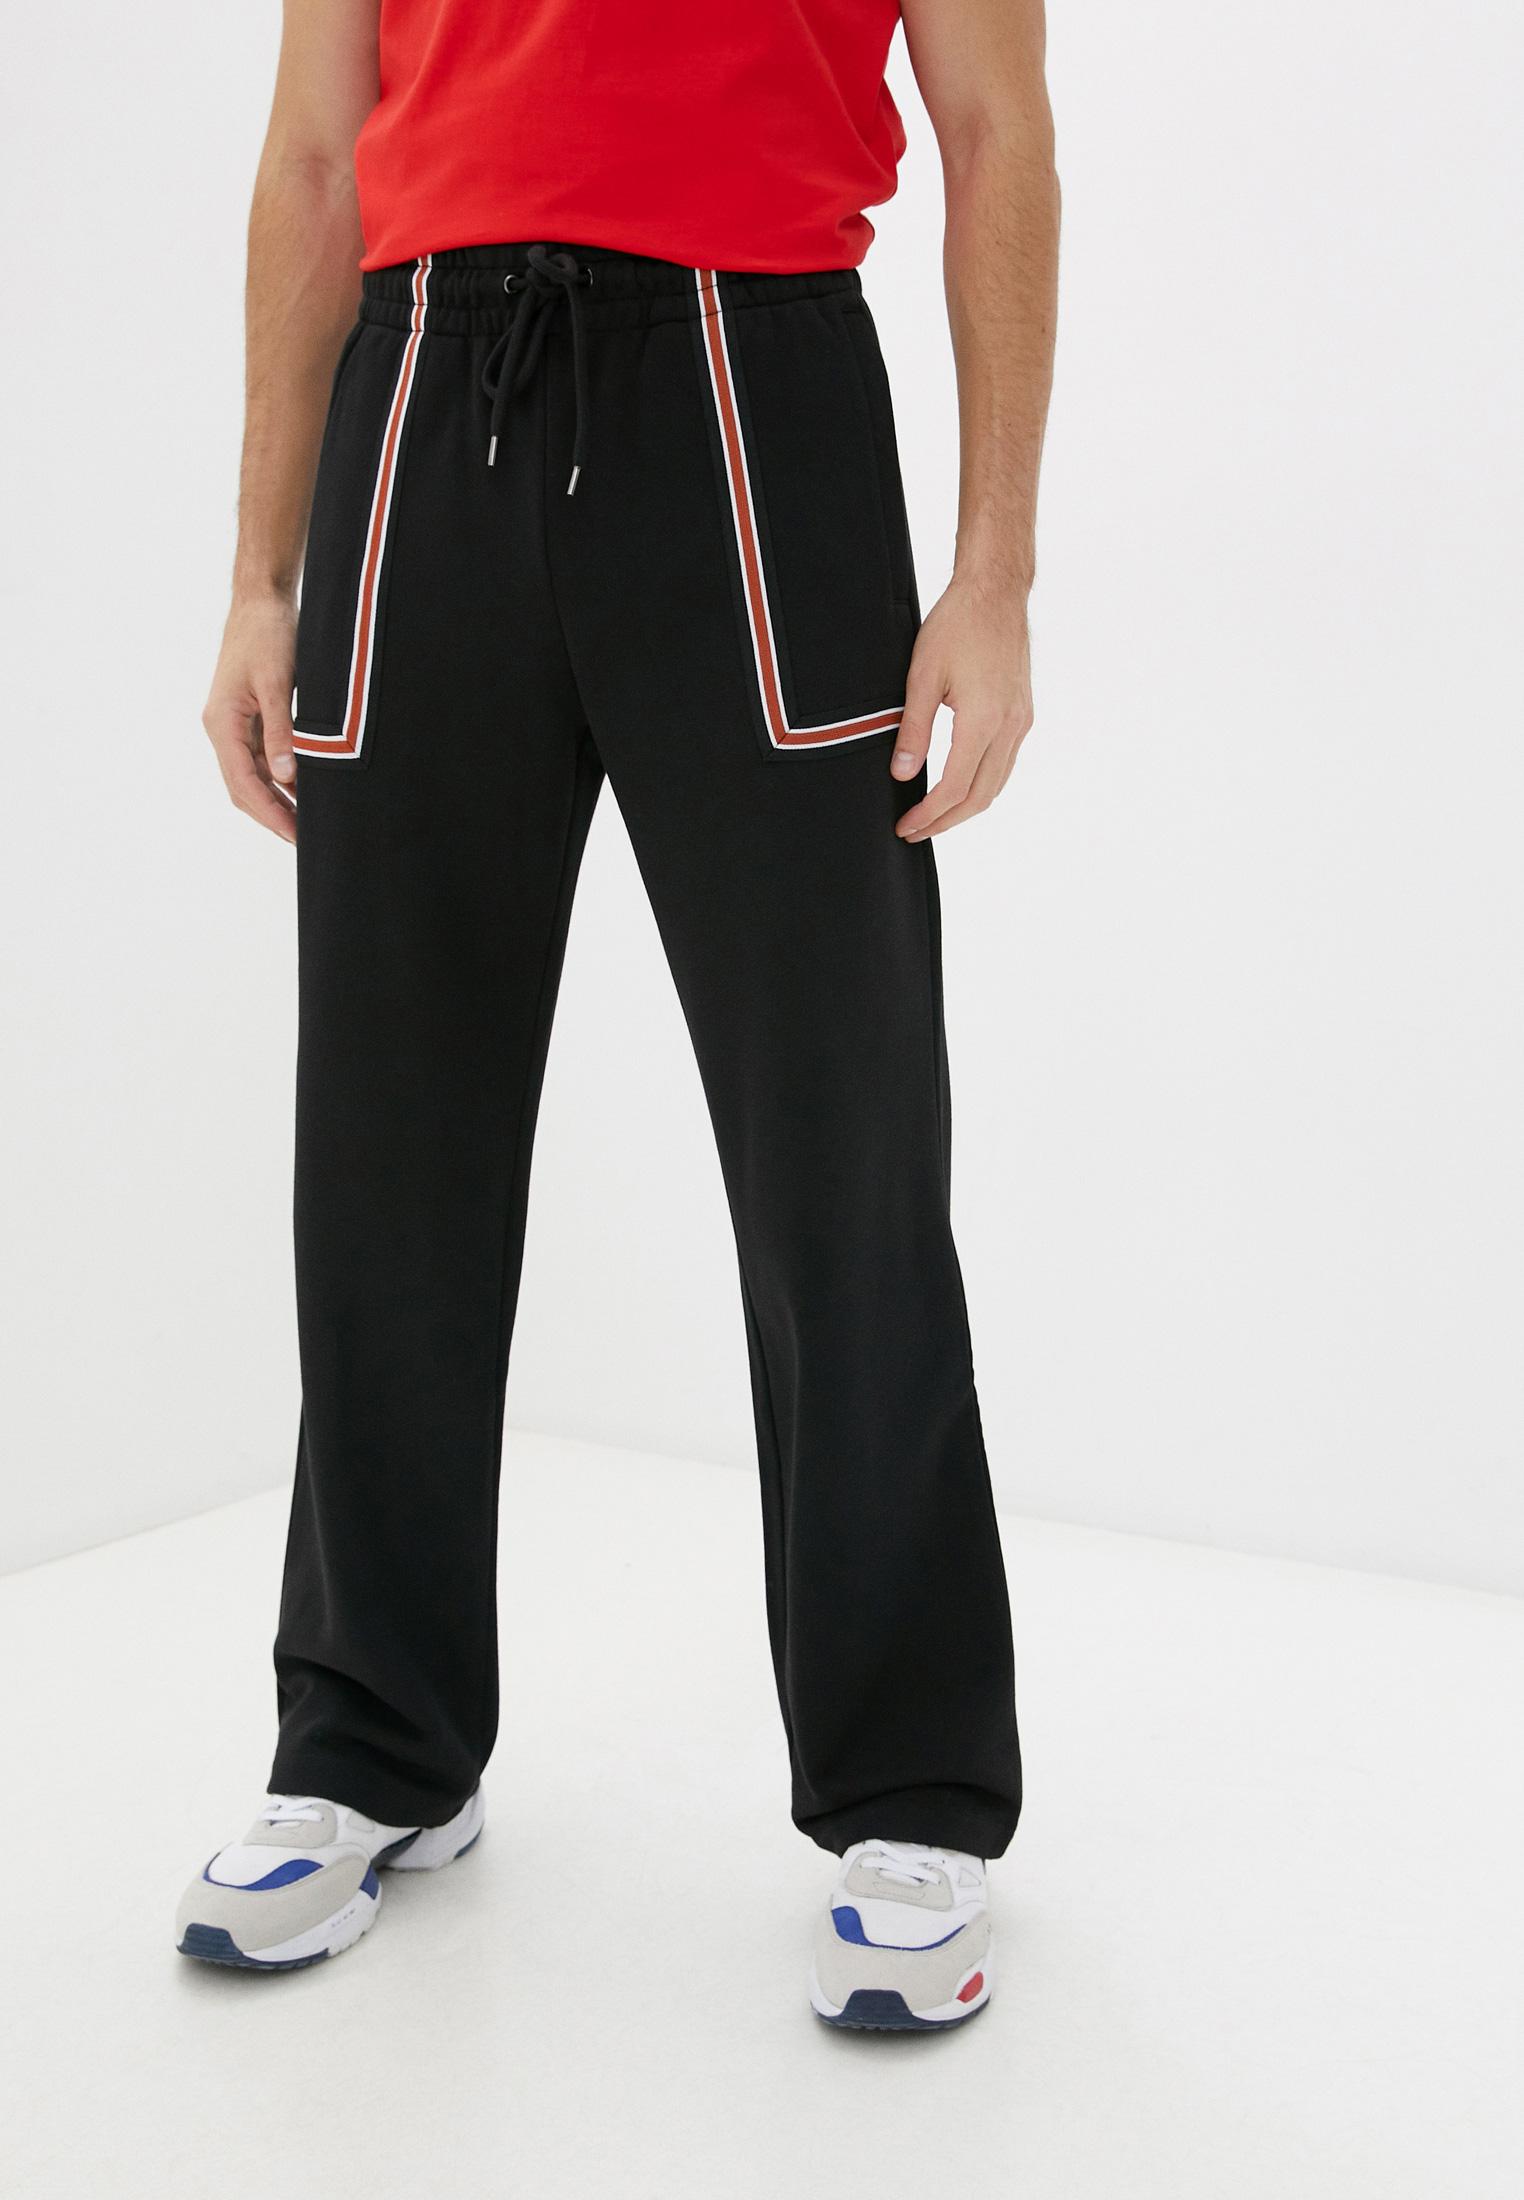 Мужские спортивные брюки Bikkembergs (Биккембергс) C 1 152 5T M 4226